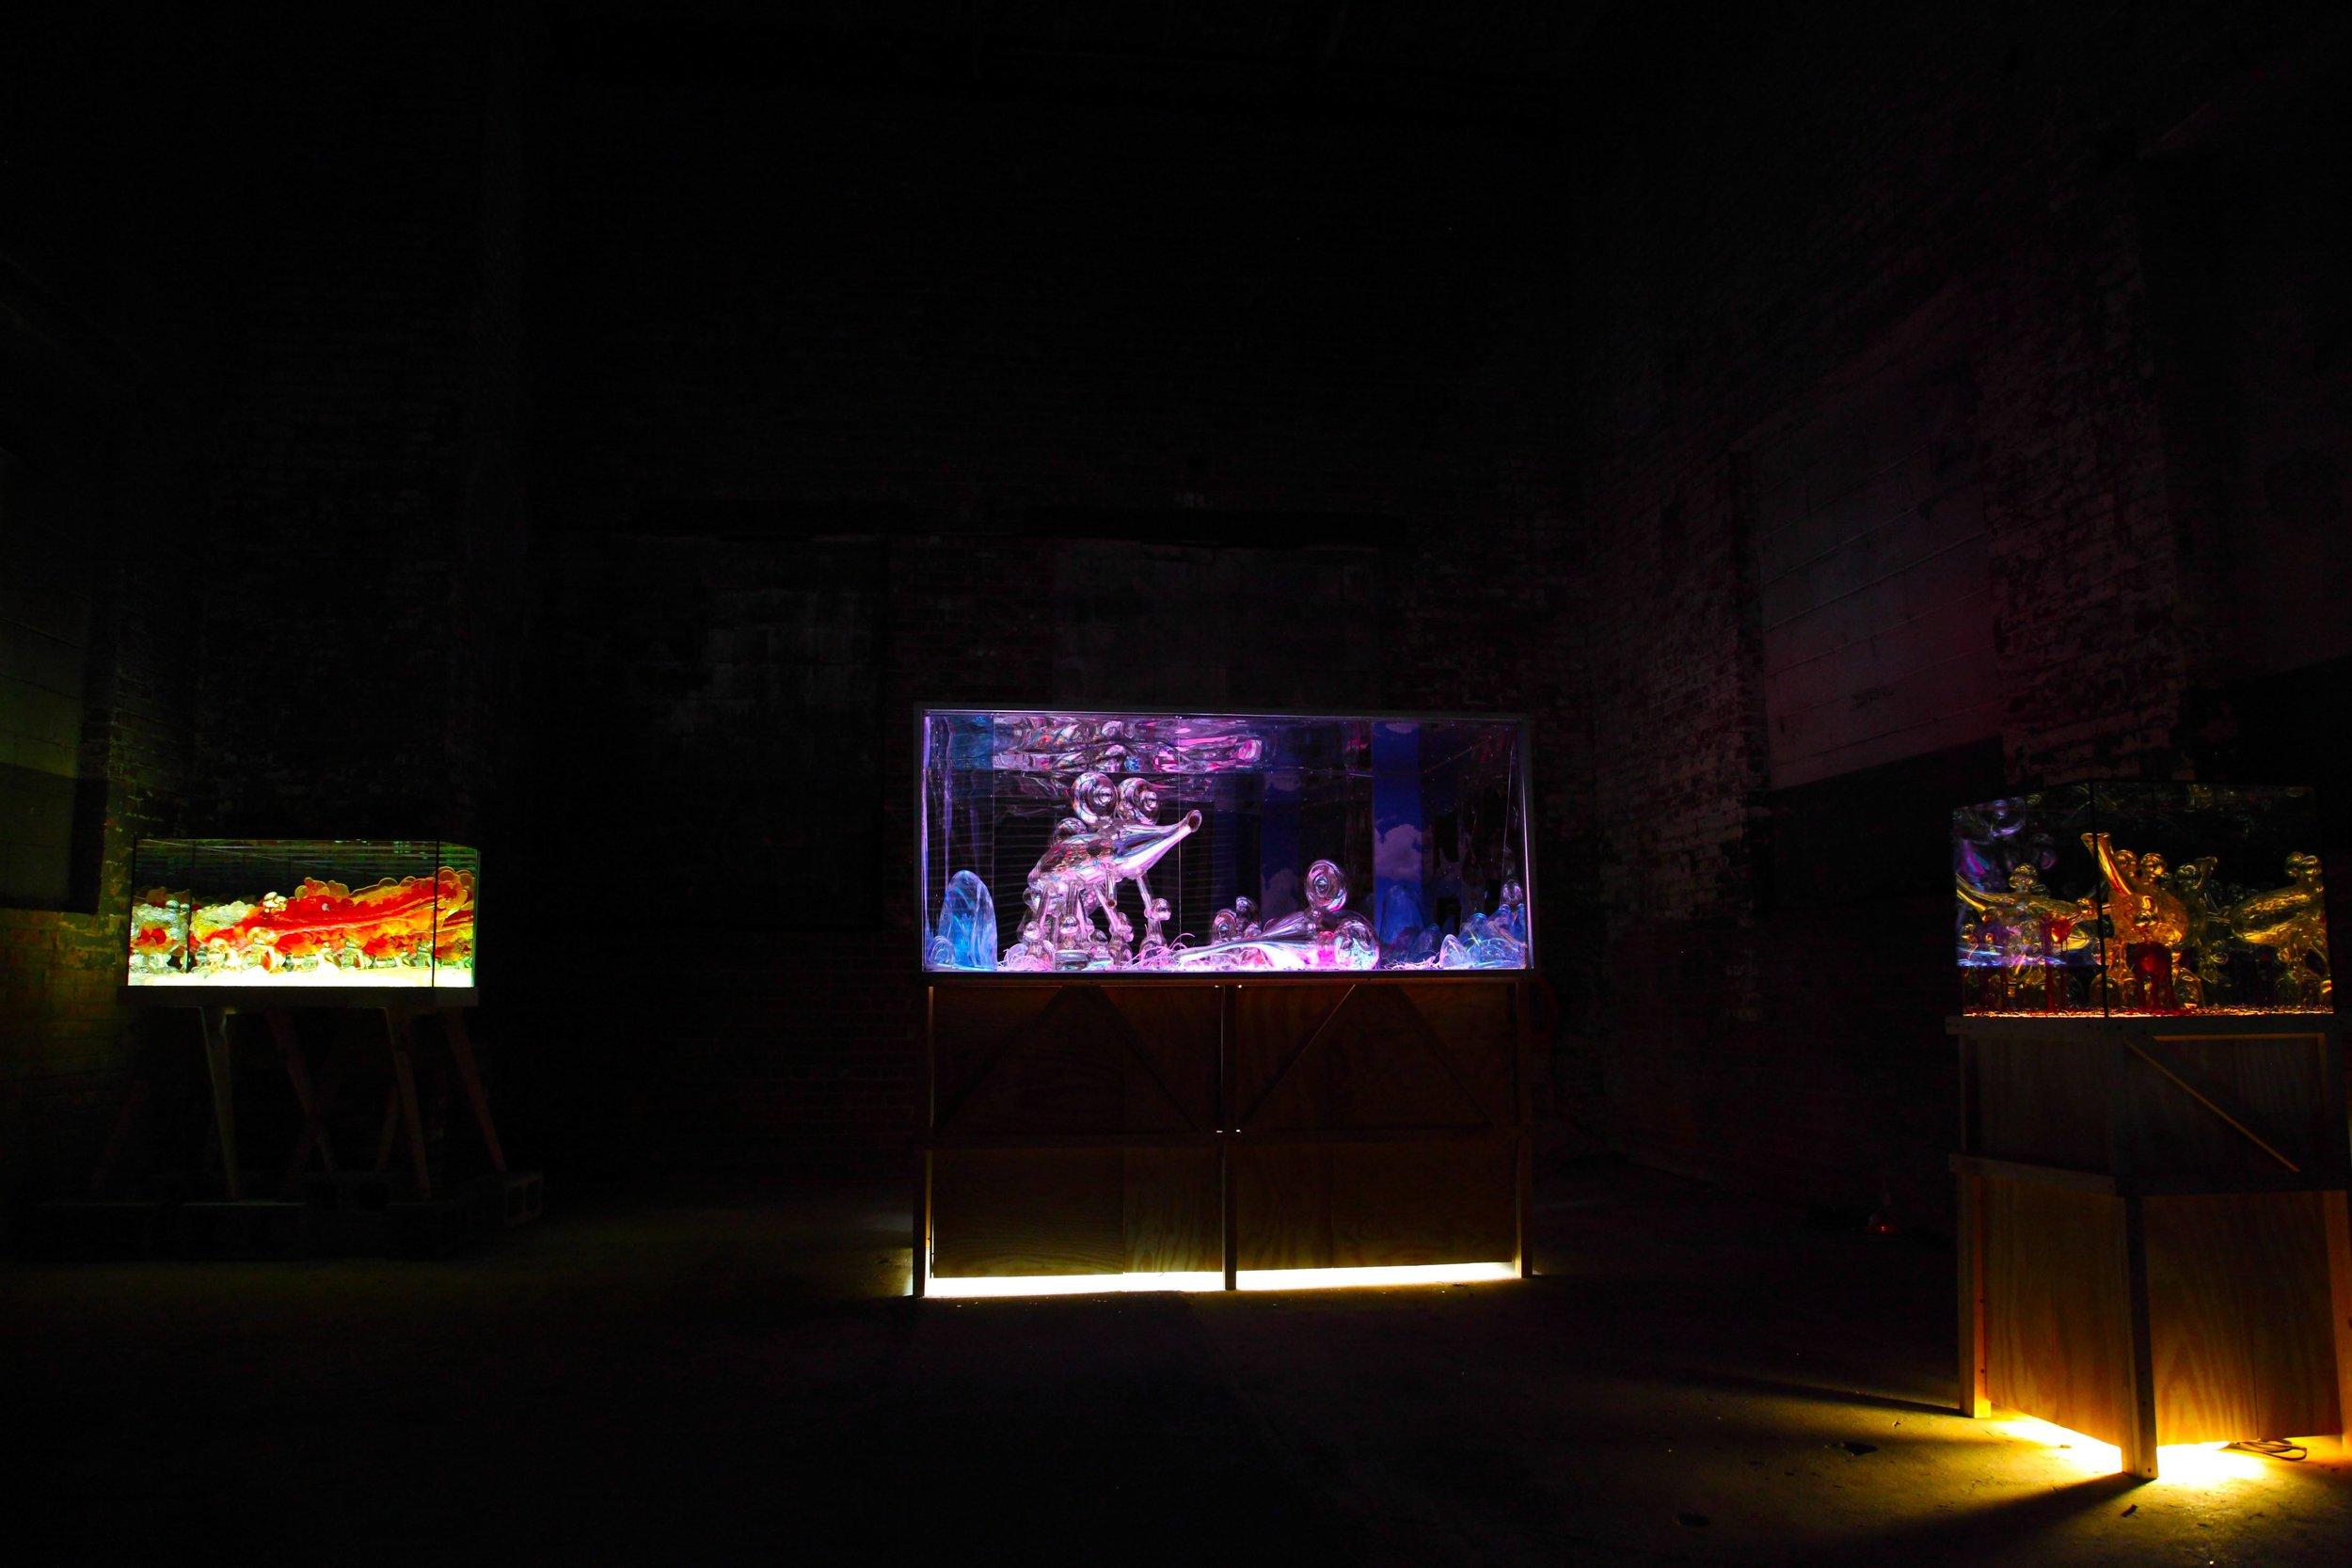 Installation View, The Chimney. Brooklyn, NY. 2015.